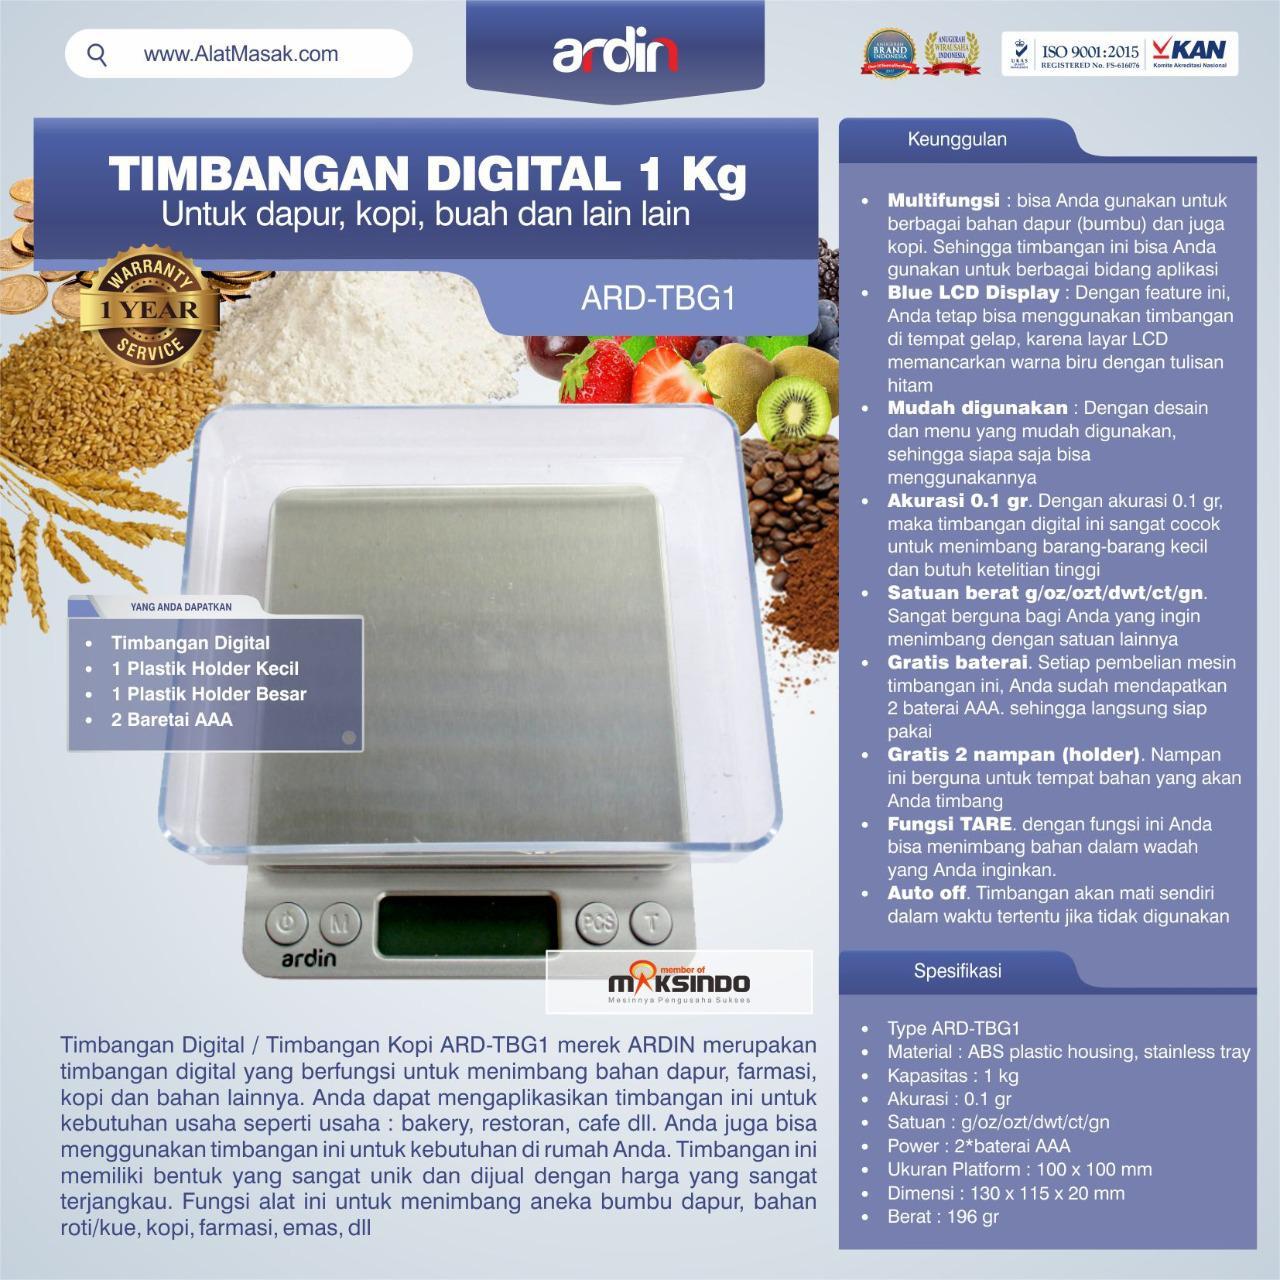 Jual Timbangan Digital Dapur 1 kg / Timbangan Kopi ARD-TBG1 di Mataram